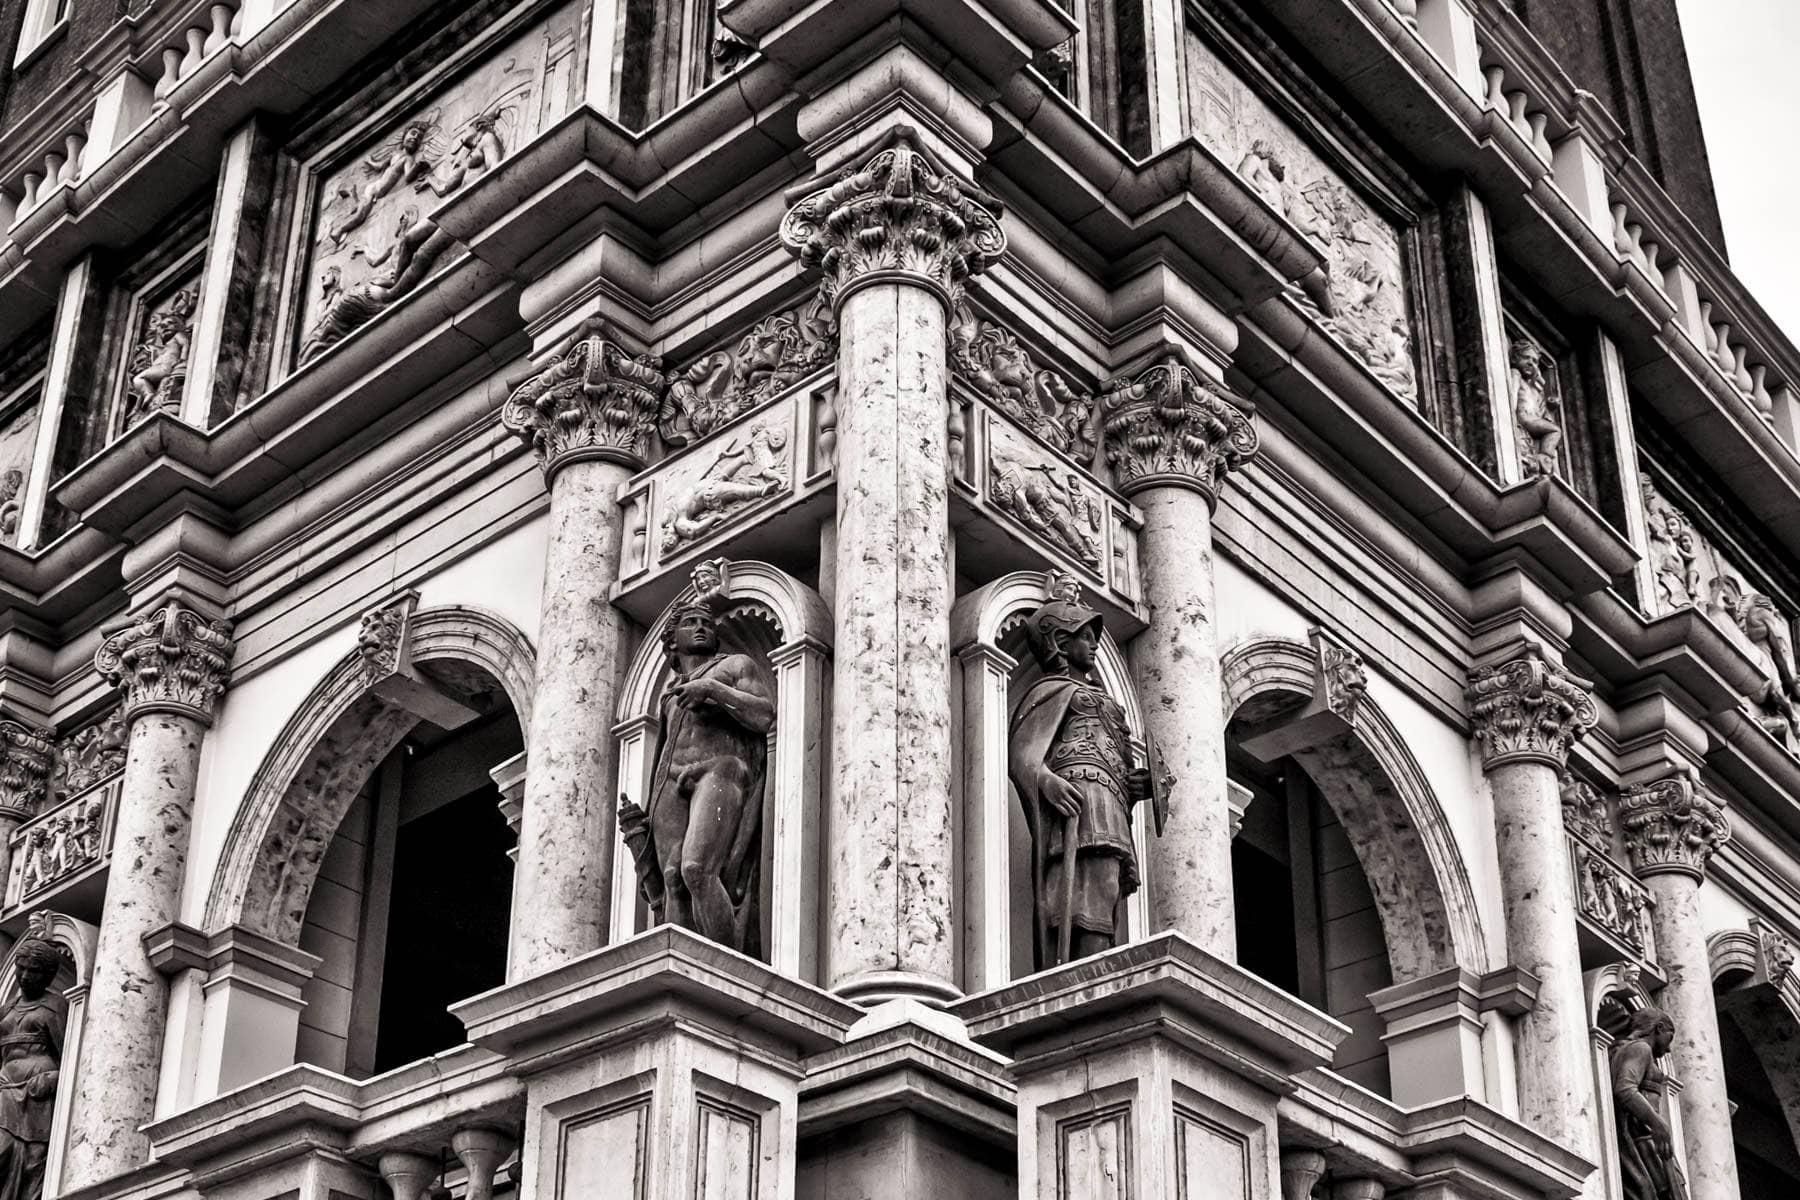 Architectural detail of The Venetian, Las Vegas.